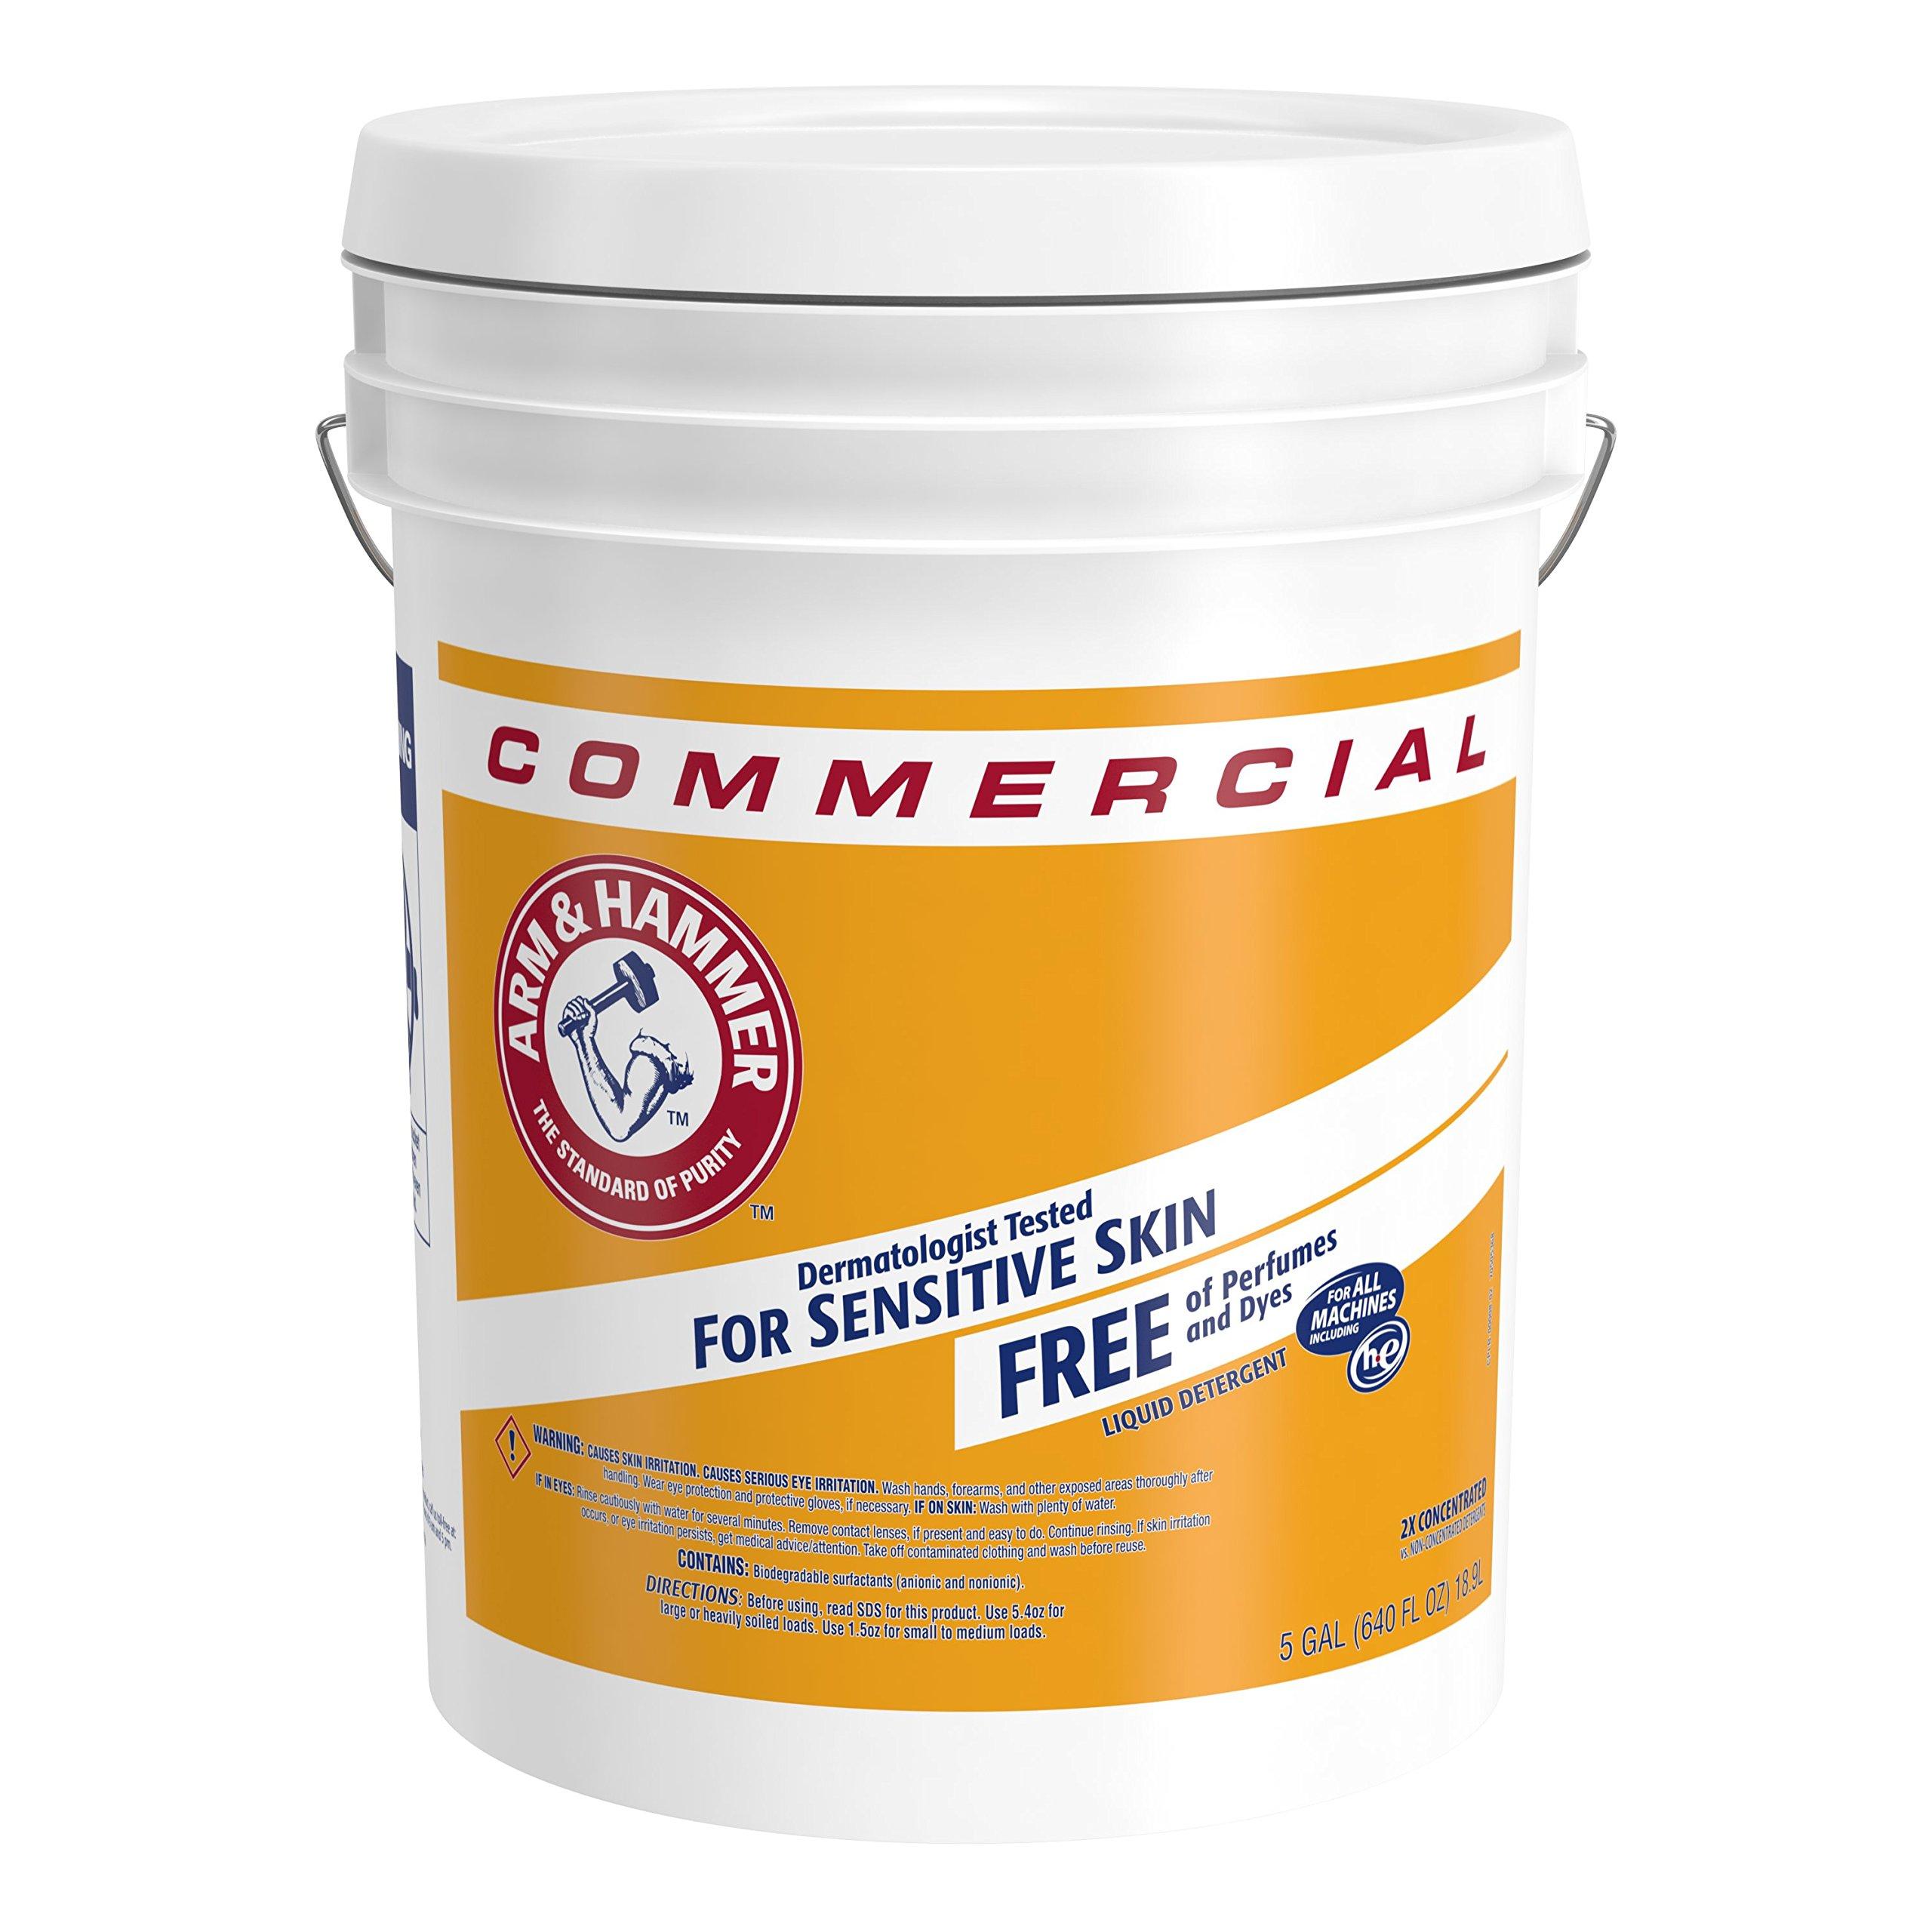 Arm & Hammer 33200-00008 Laundry Detergent Perfume/Dye Free, Liquid, 5 gal, 640 fl. oz.